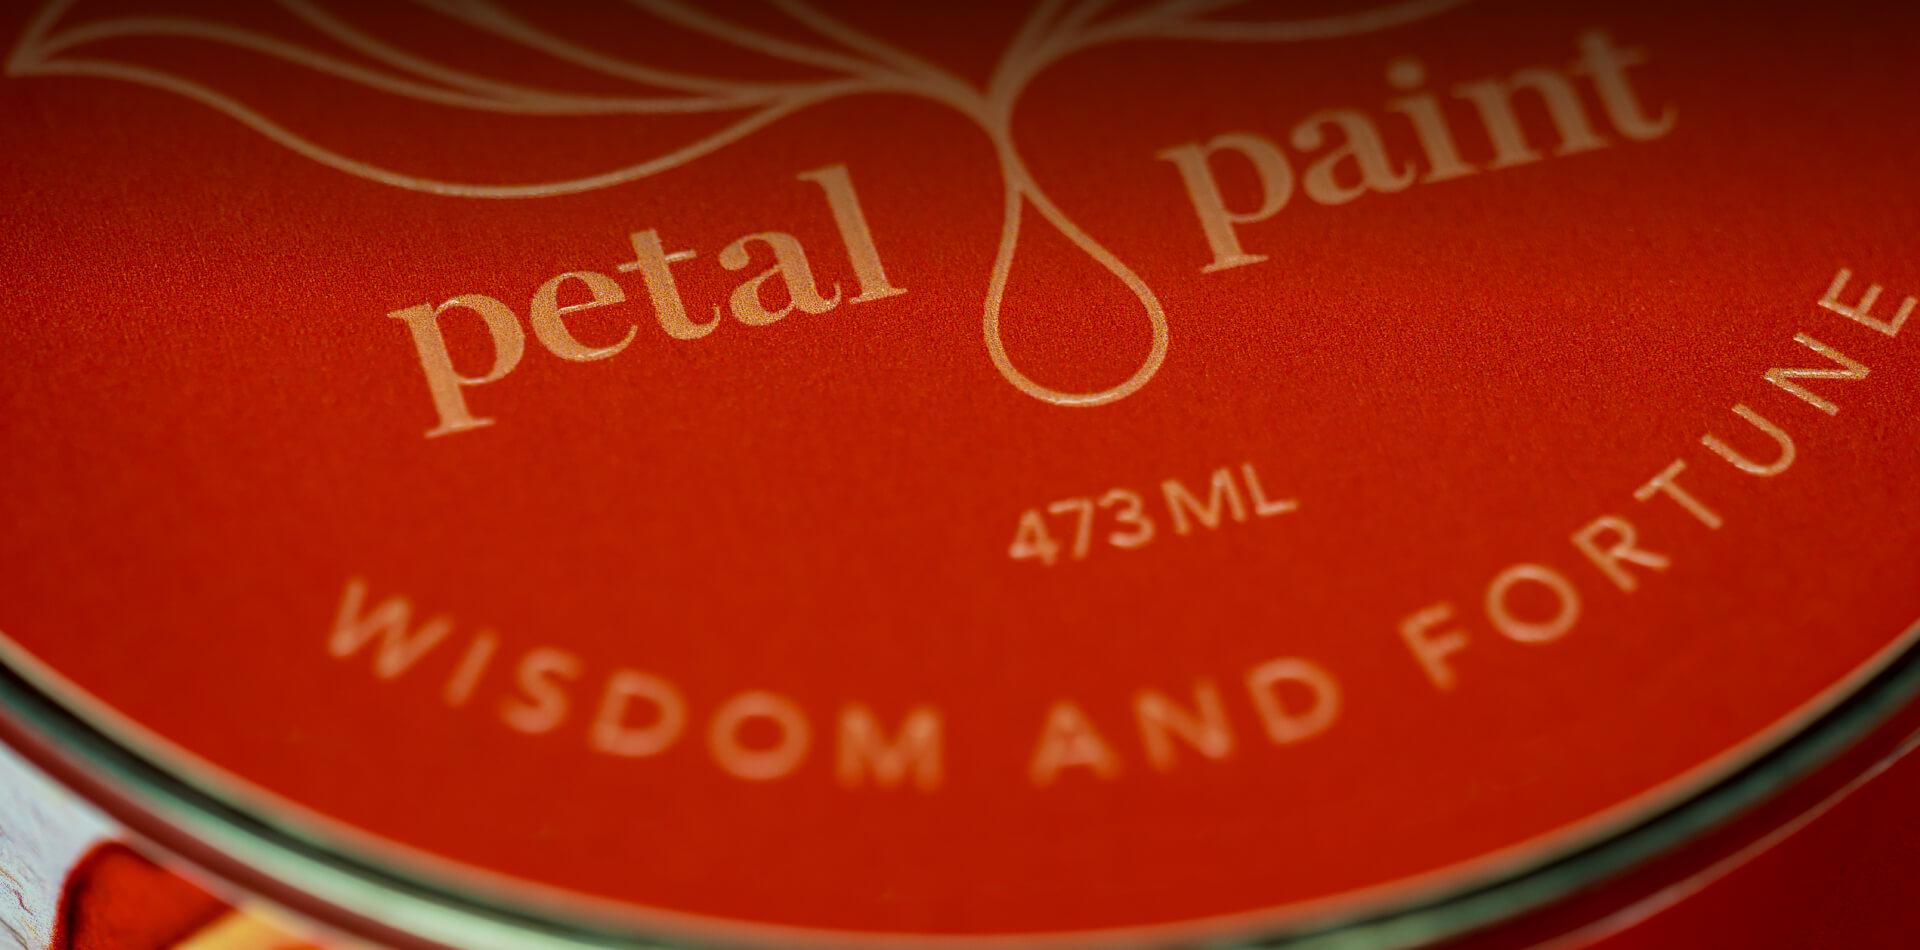 Petal Paint Wisdom and Fortune Label